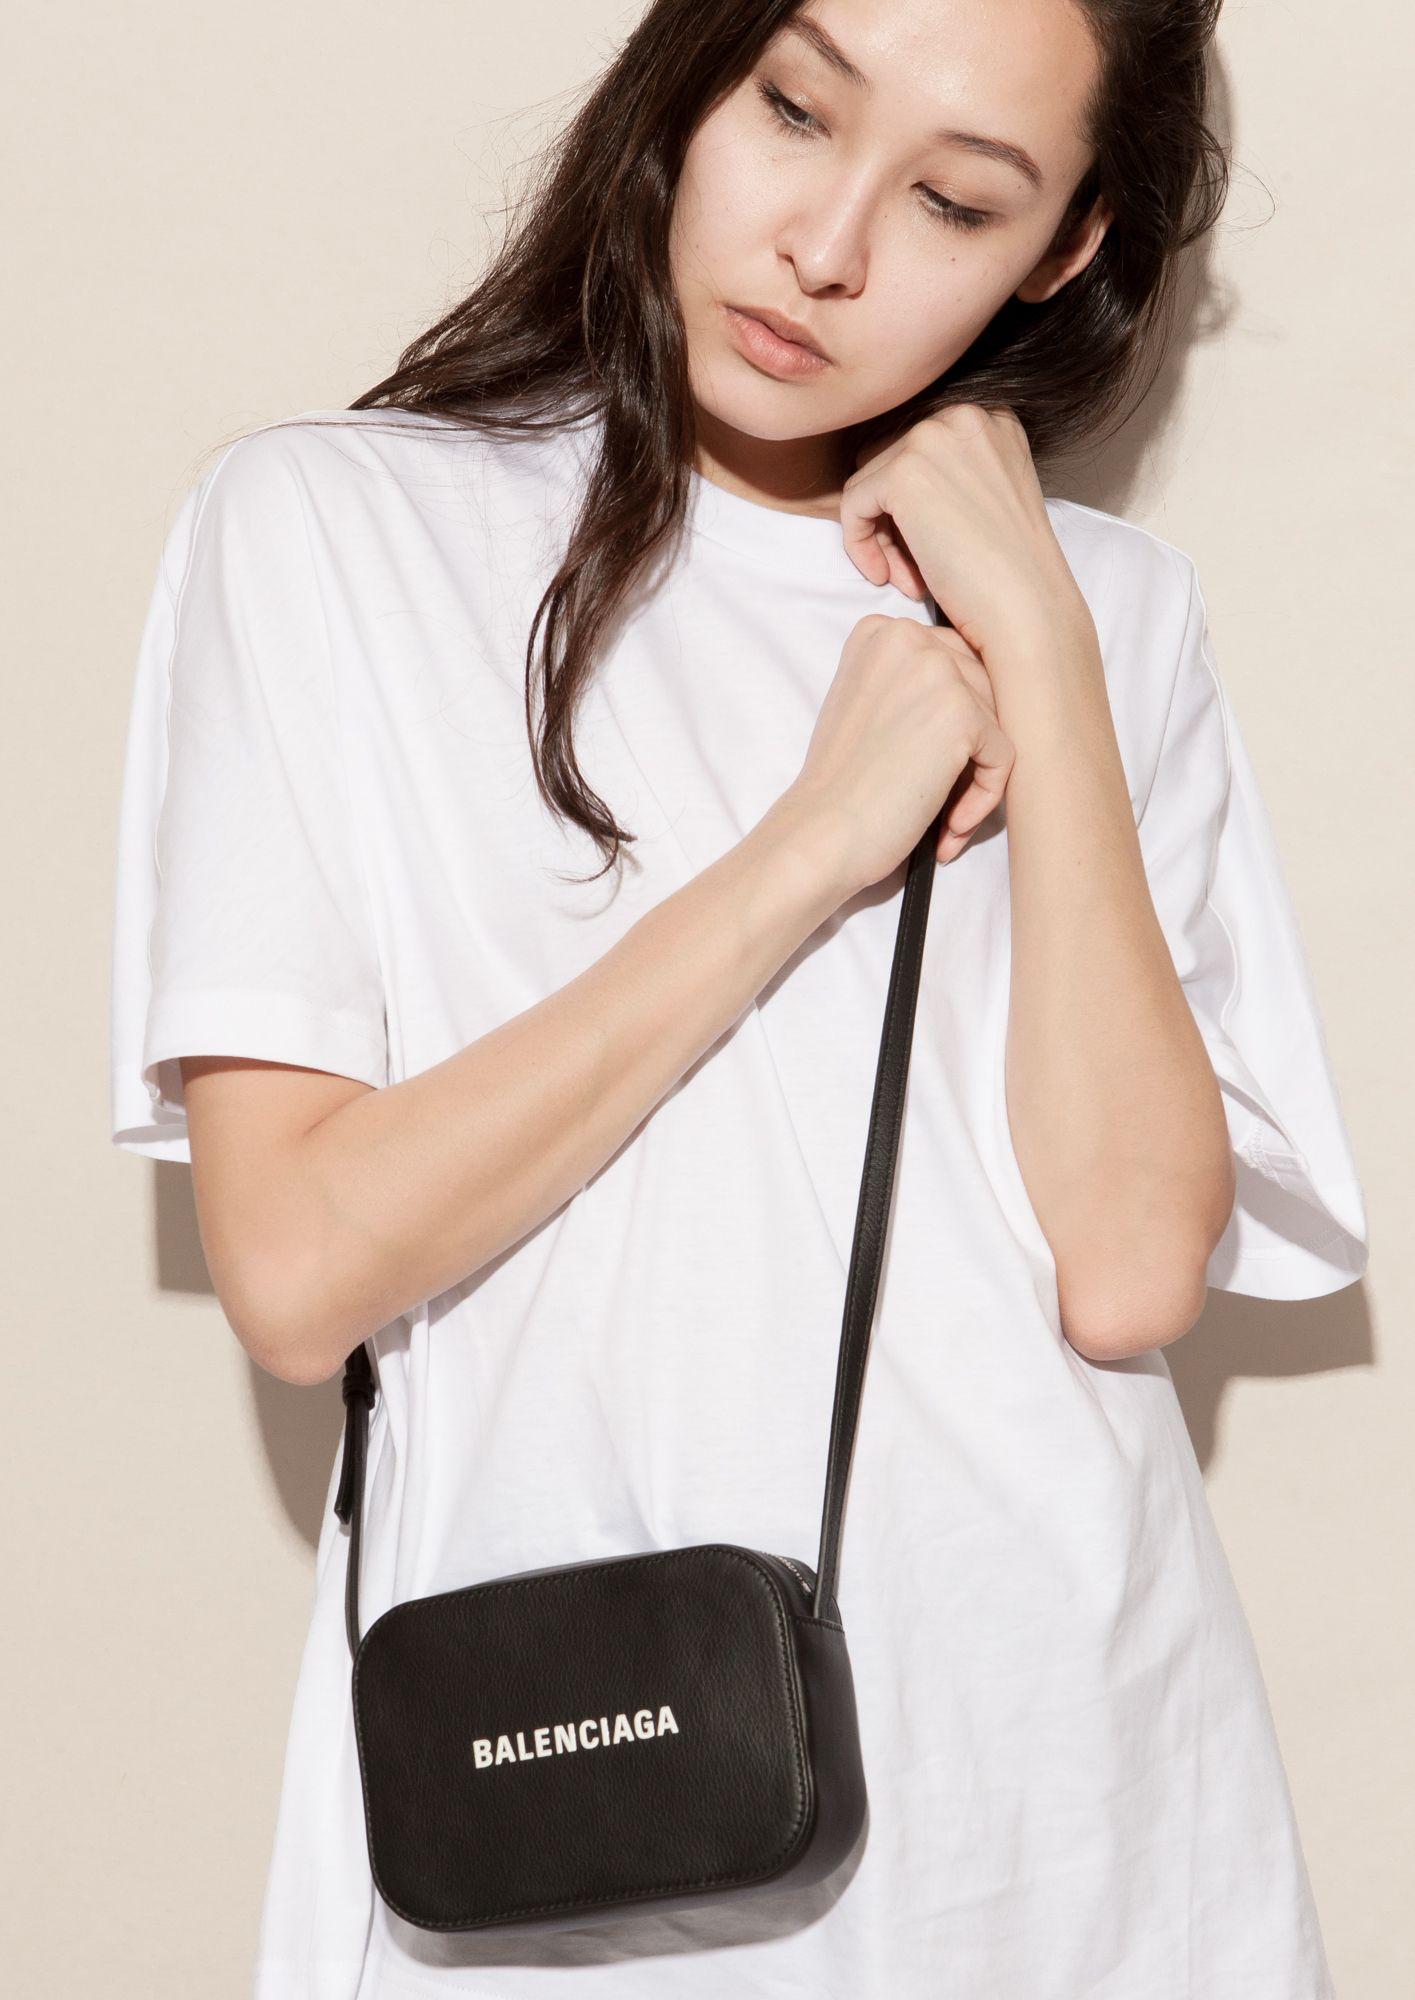 Balenciaga XS camera bag | Black camera